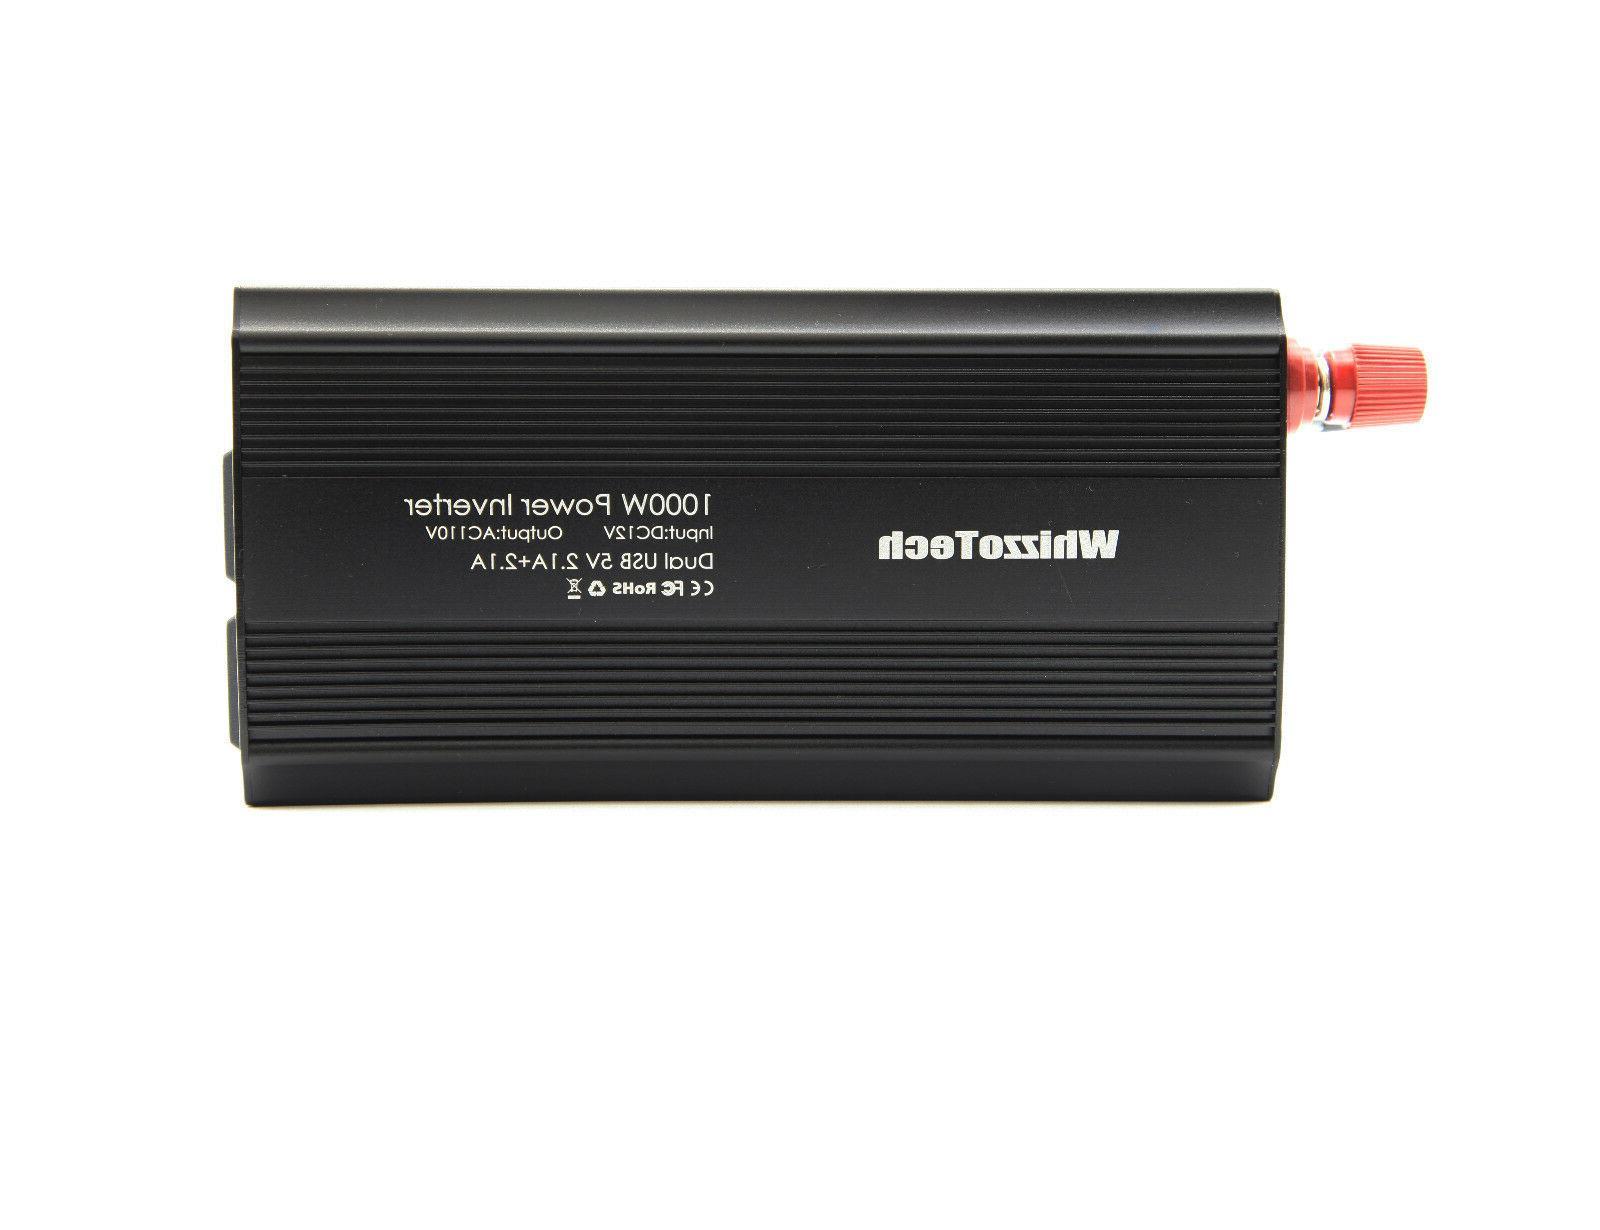 1000W 2000W Car Power Inverter 12V AC 110V 2 Outlets RV